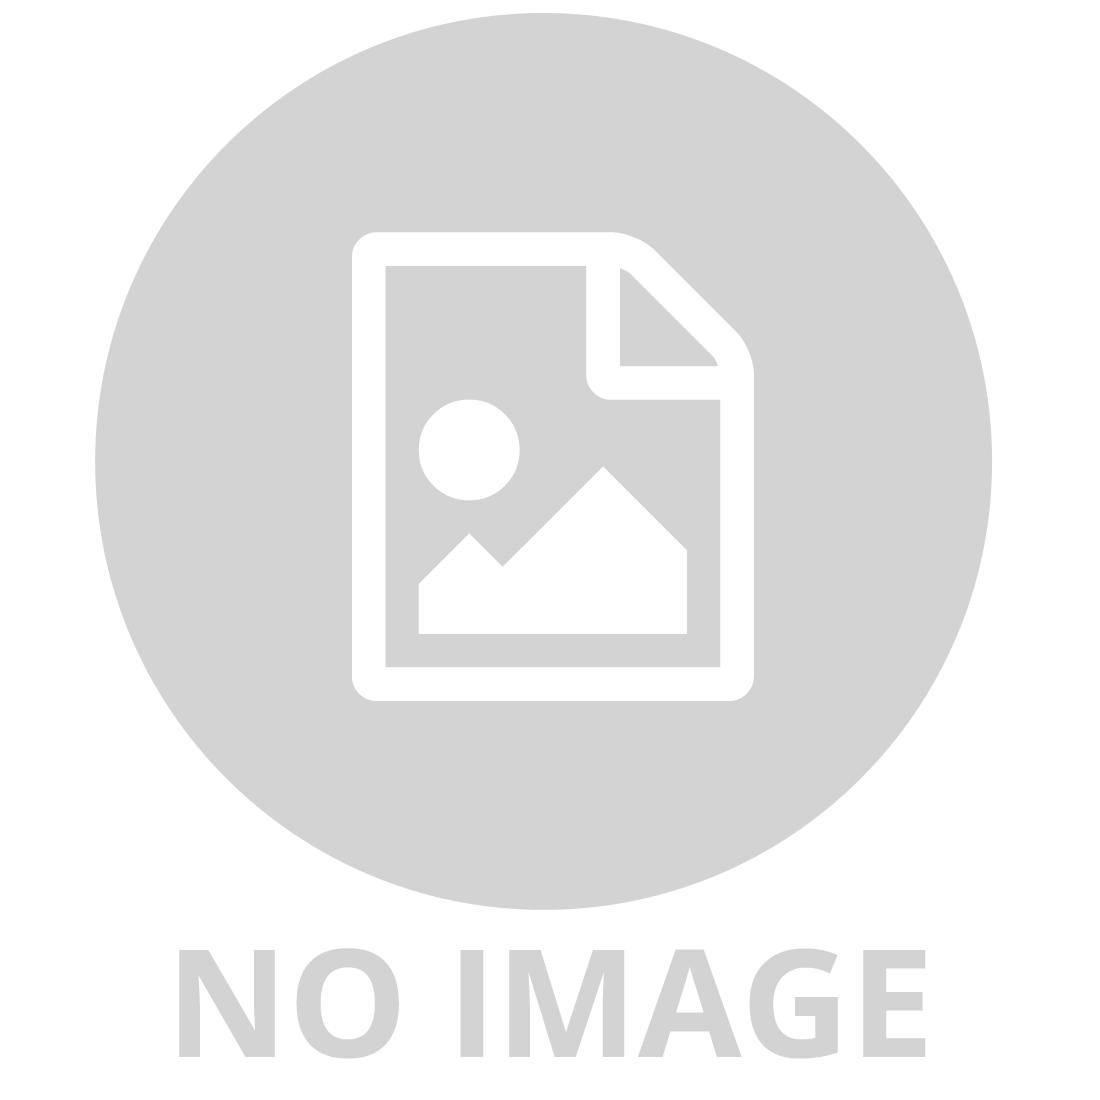 DOLLS WORLD WOODEN BUNK BED